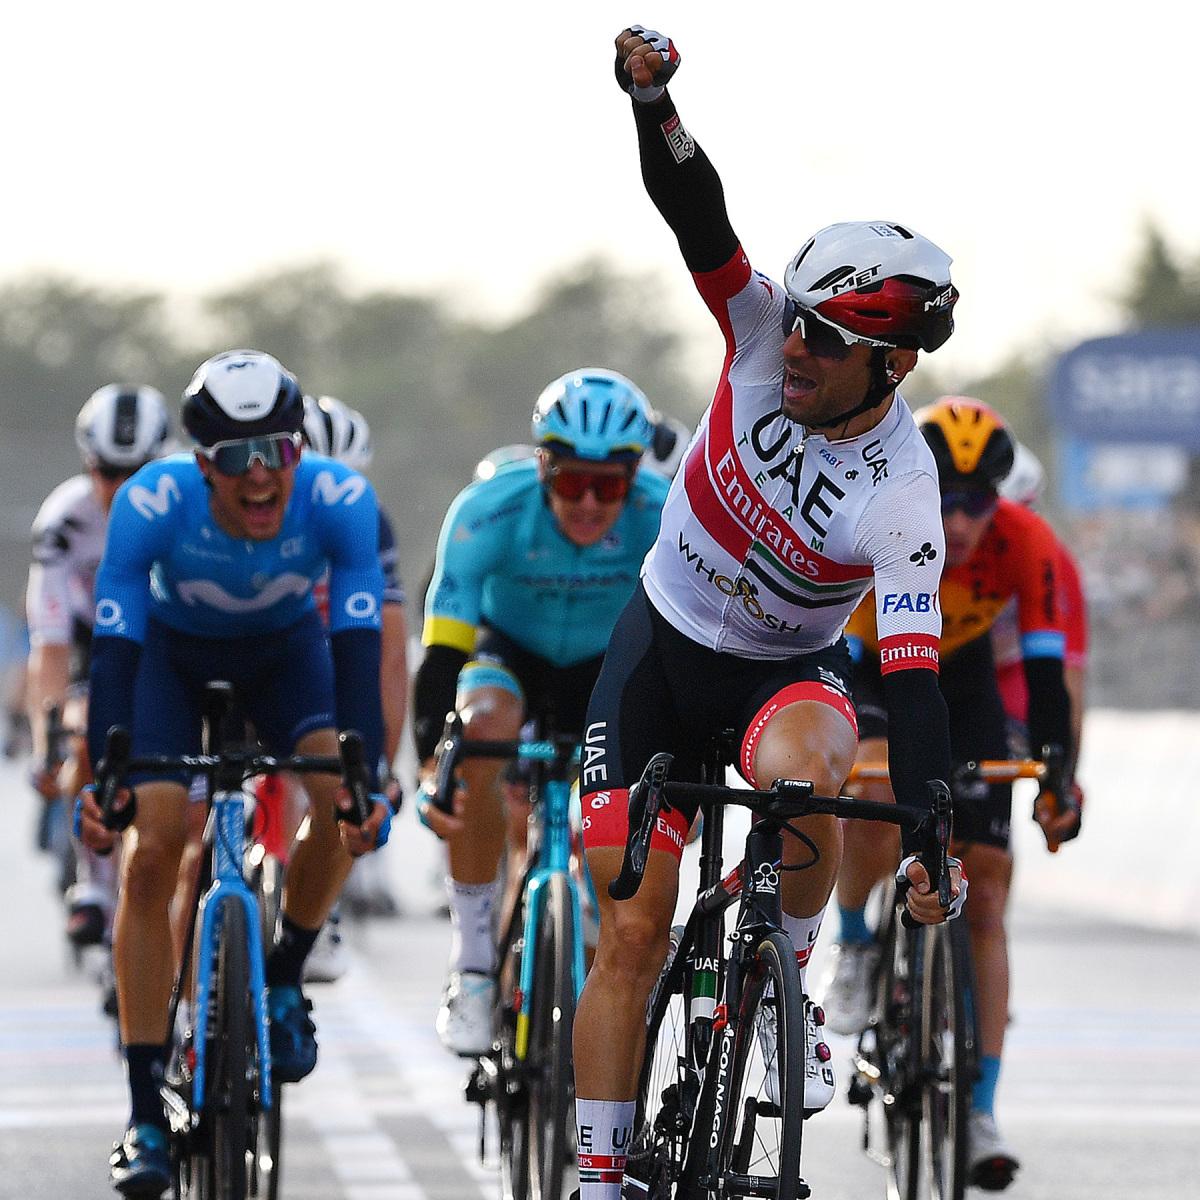 Diego Ulissi OK'd to resume training, Caja Rural thankful for Vuelta return – VeloNews.com